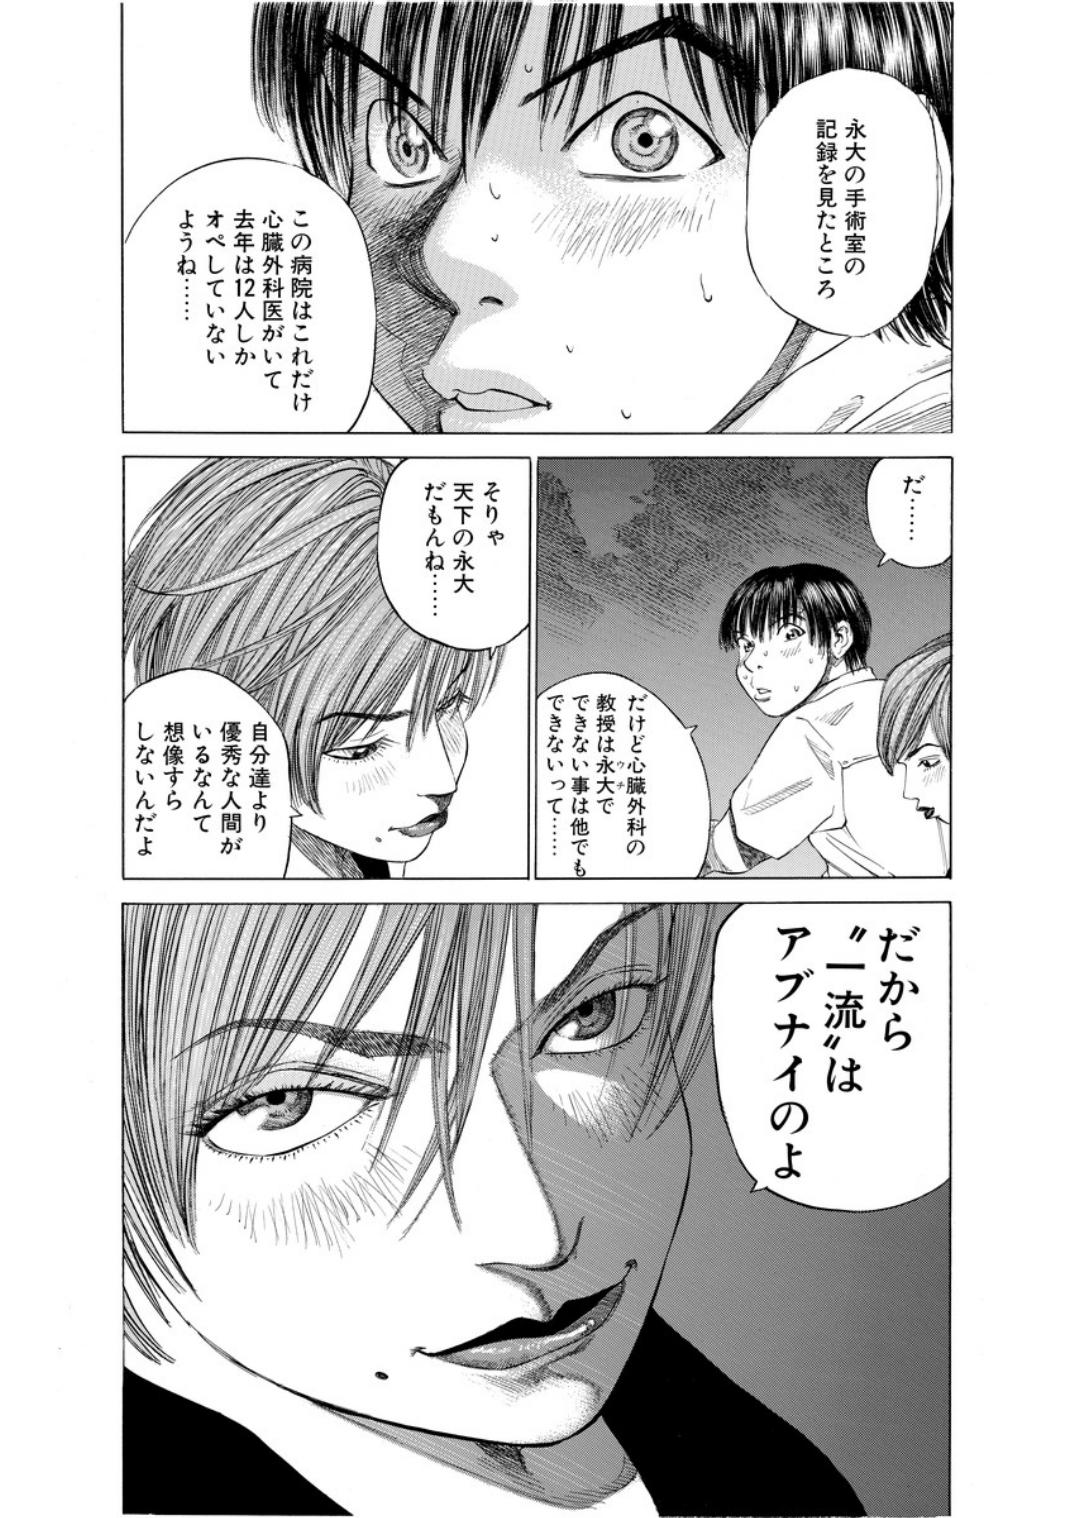 001bj_page-0207.jpg